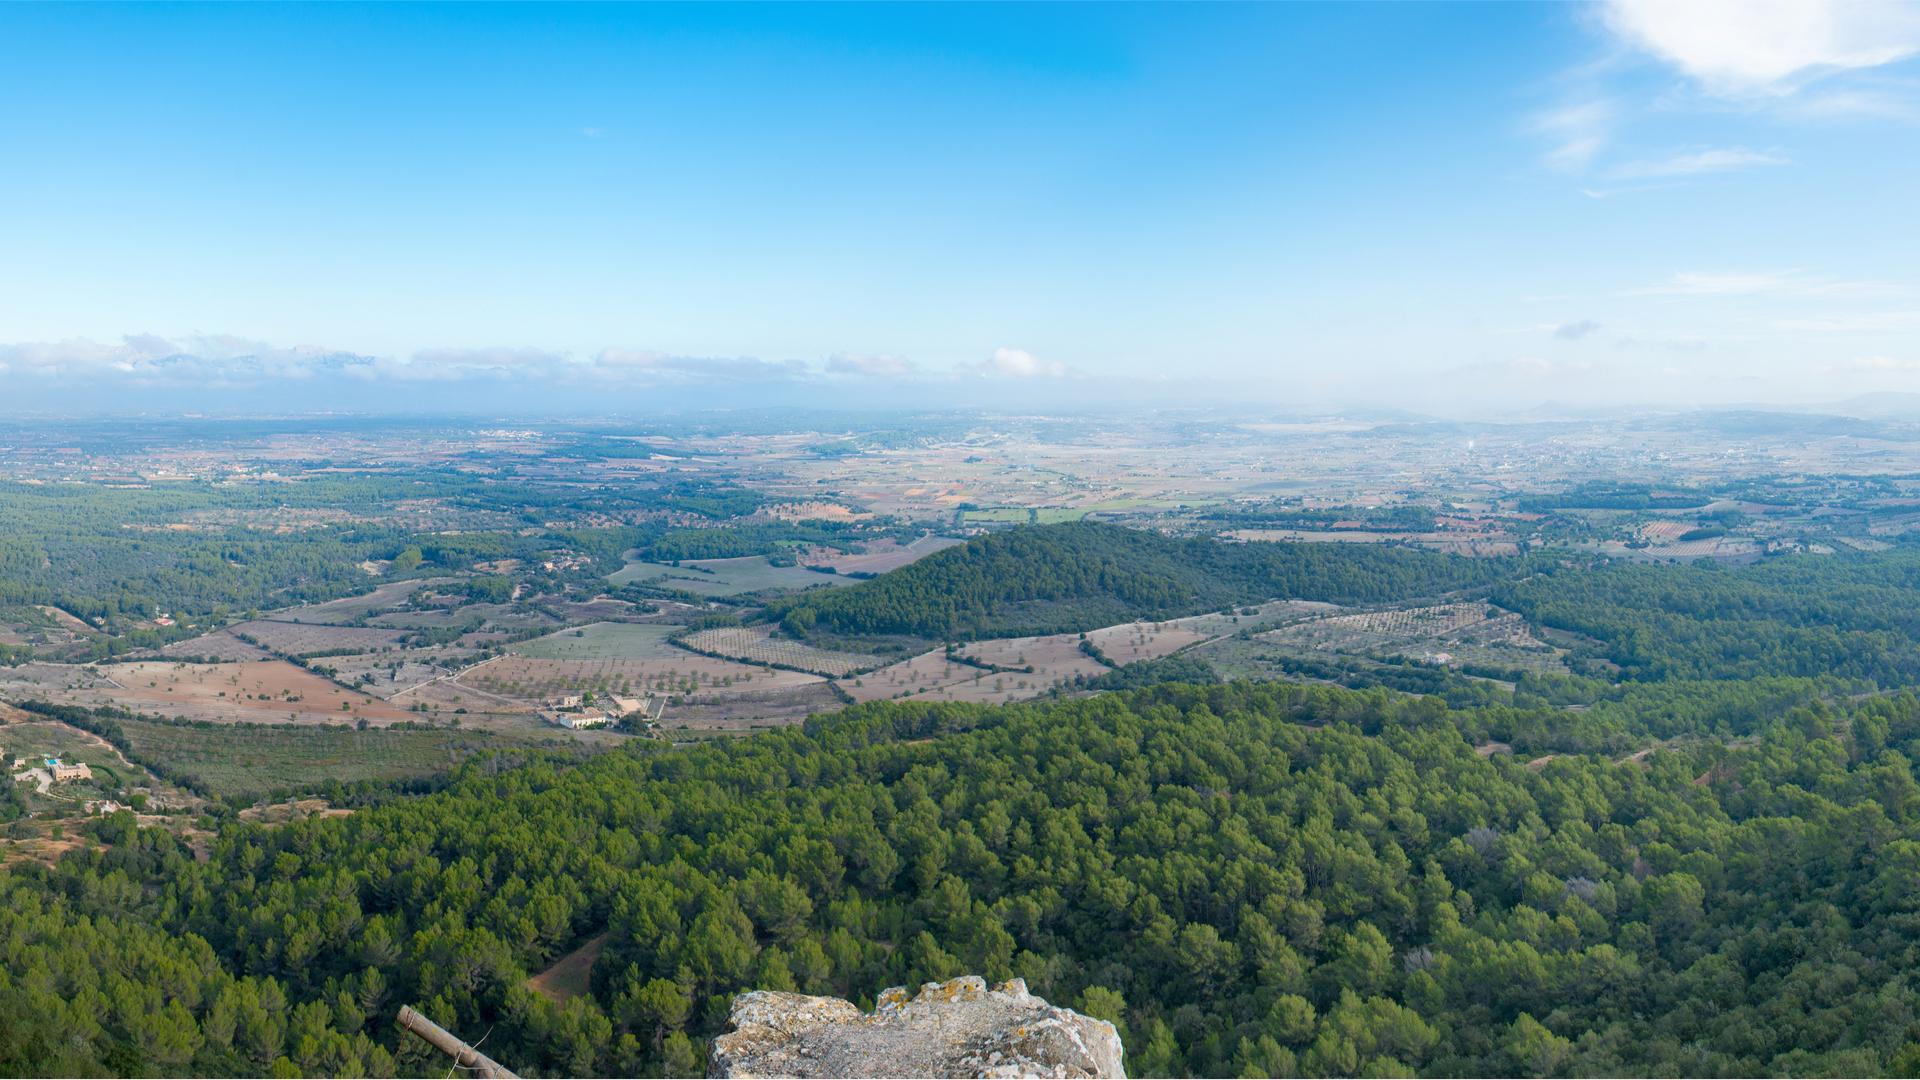 Aerial view monastery santuari de cura